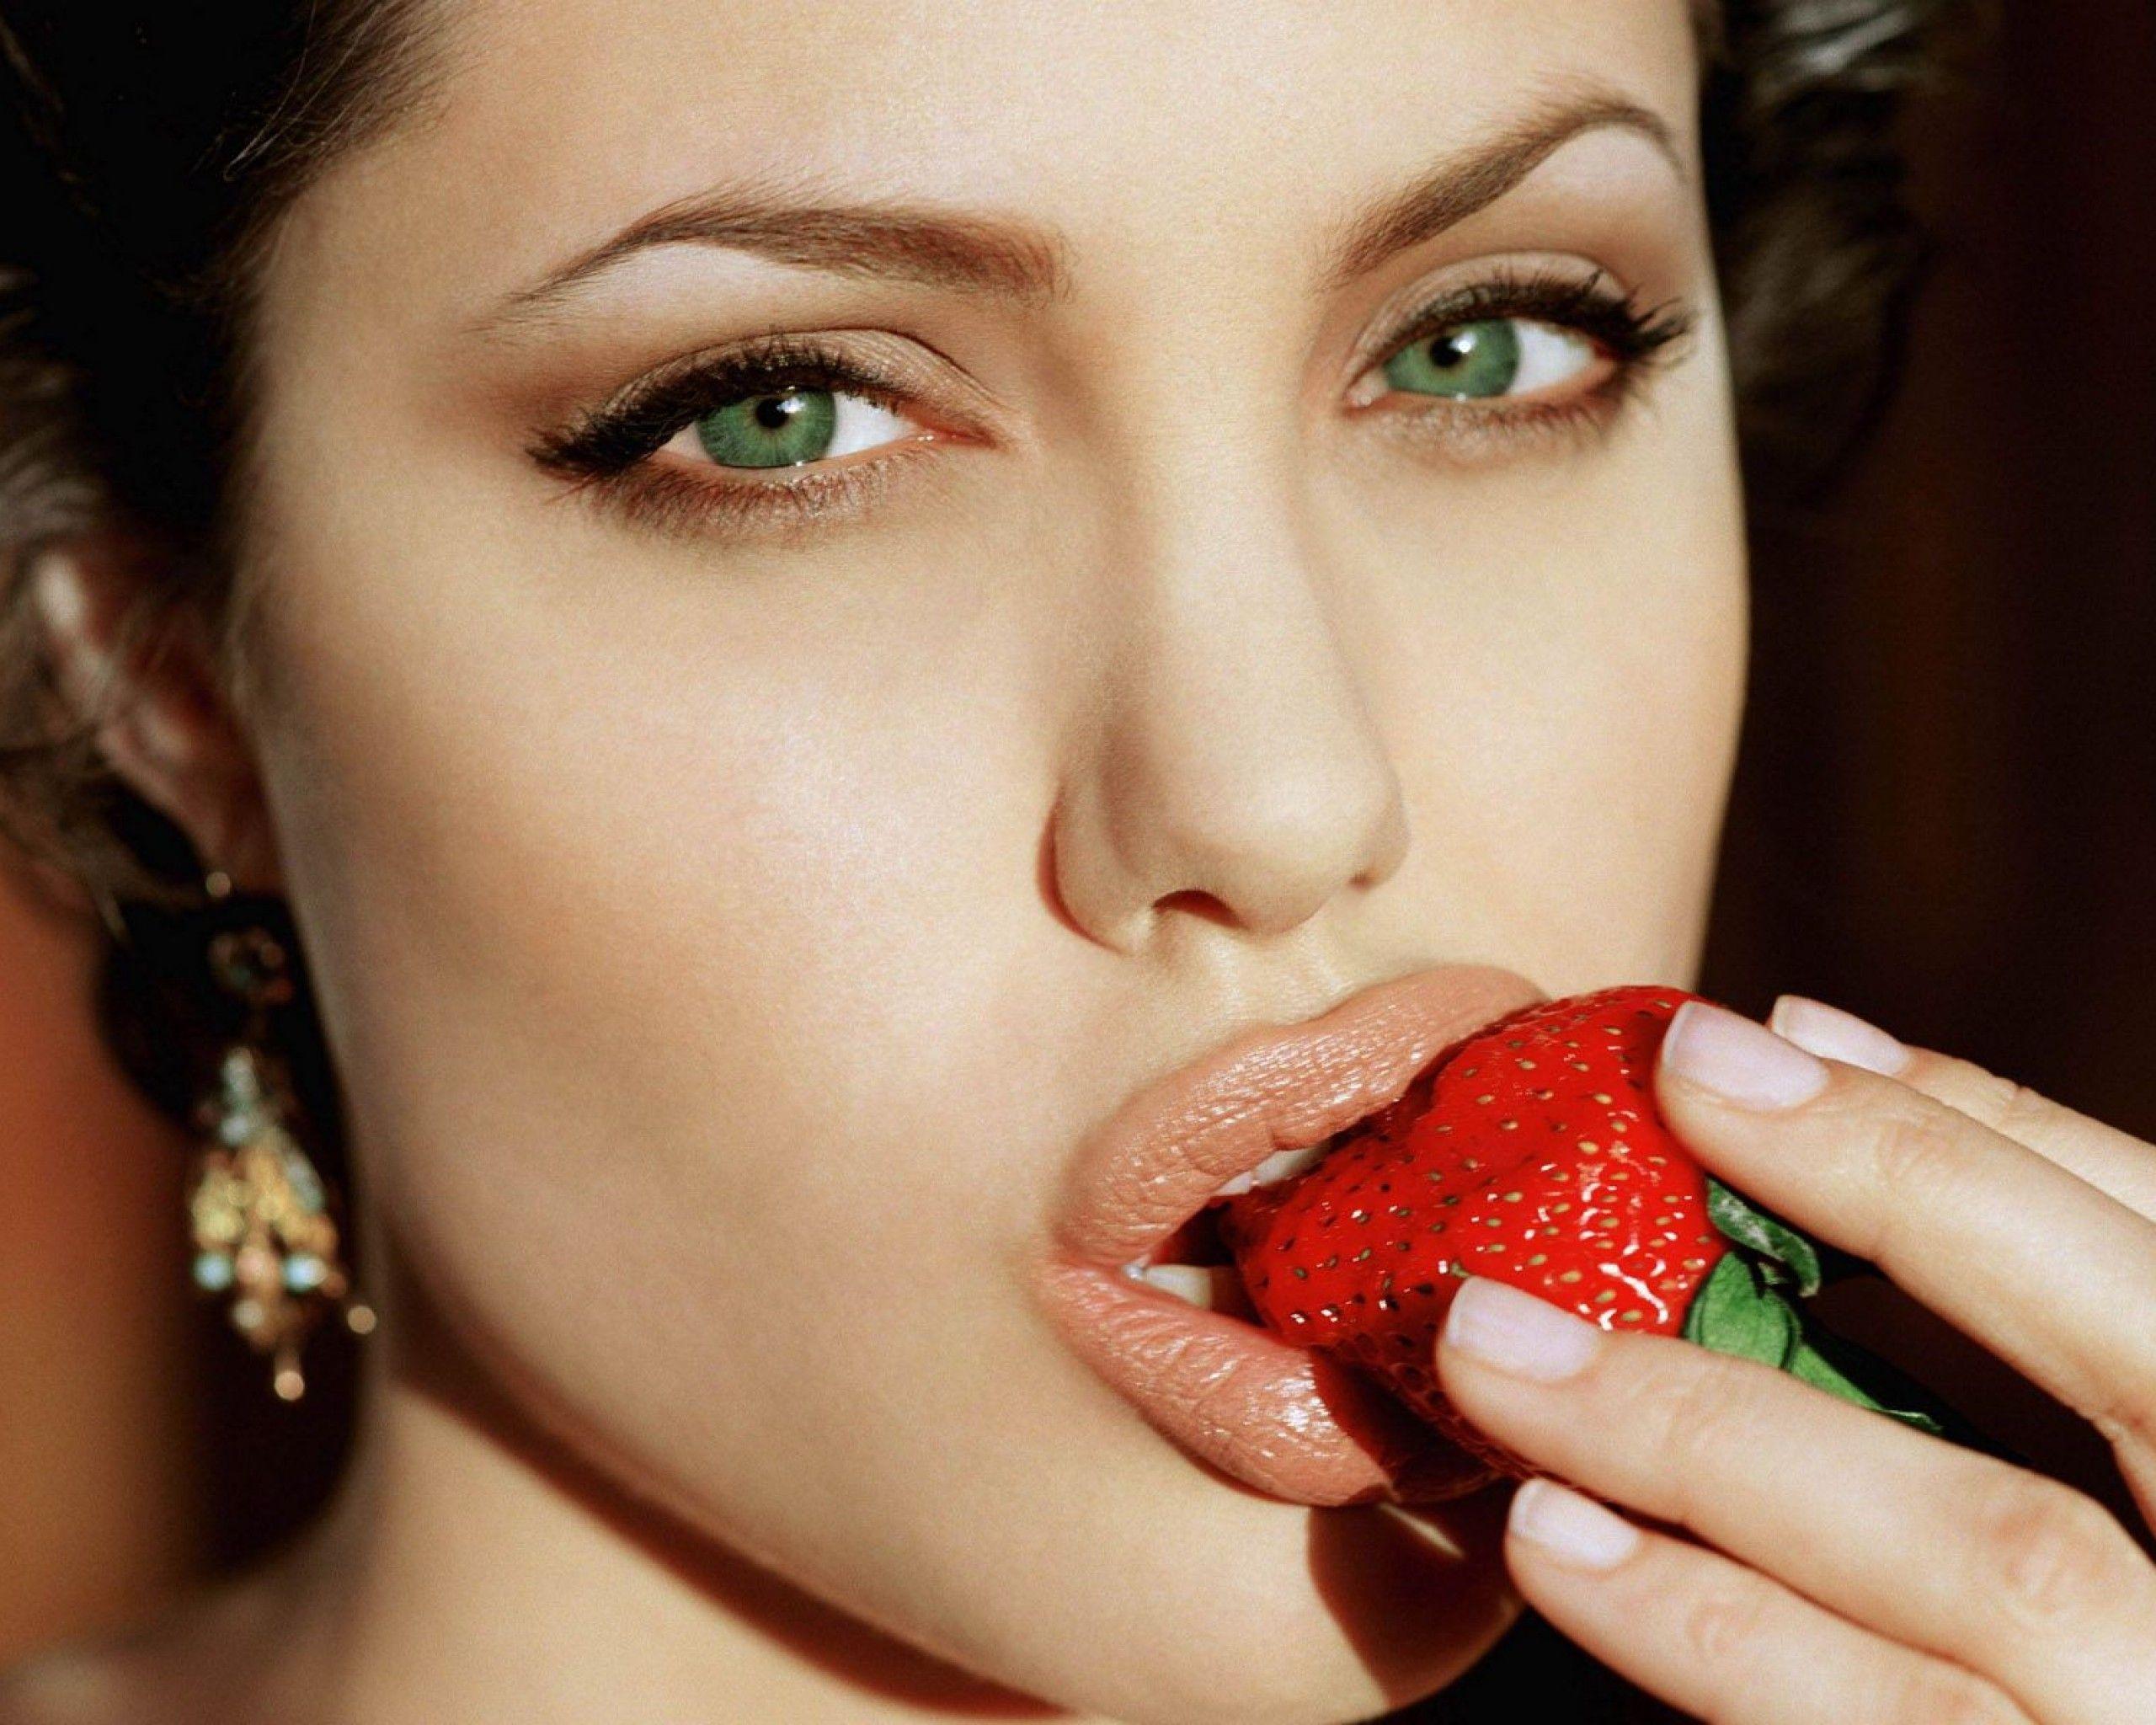 Angelina jolie green eyes